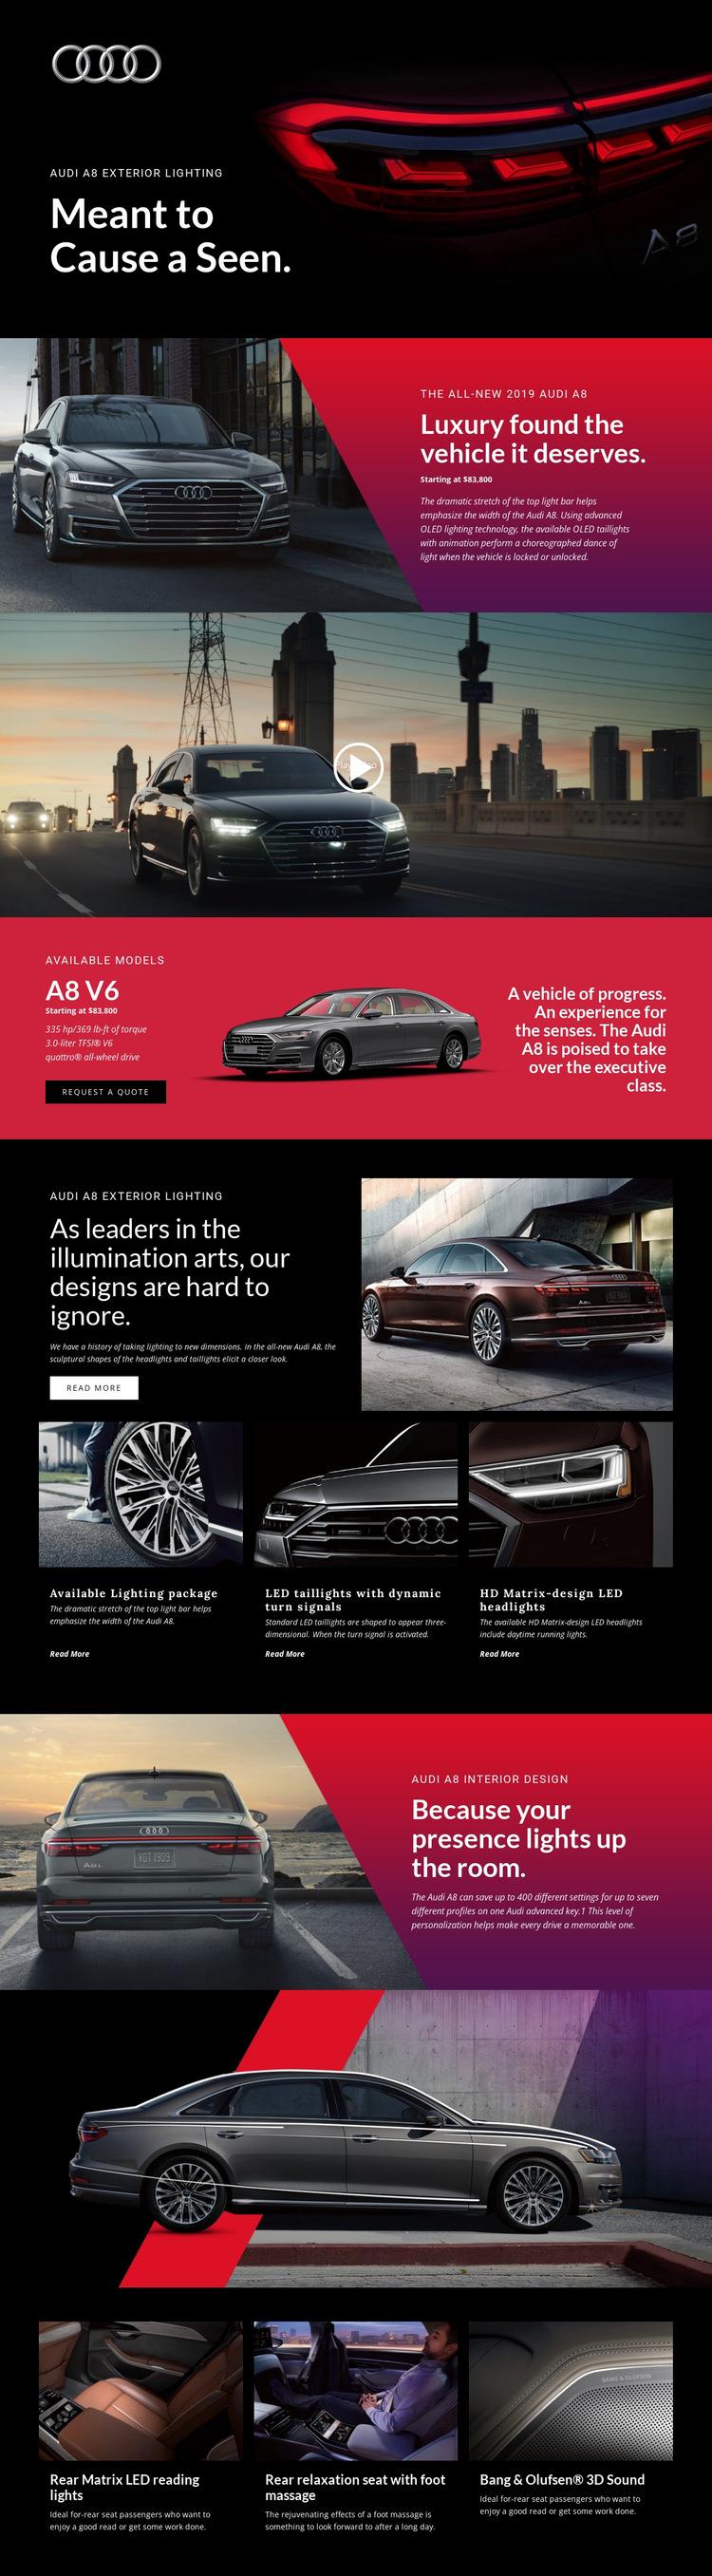 Audi luxury cars HTML5 Template